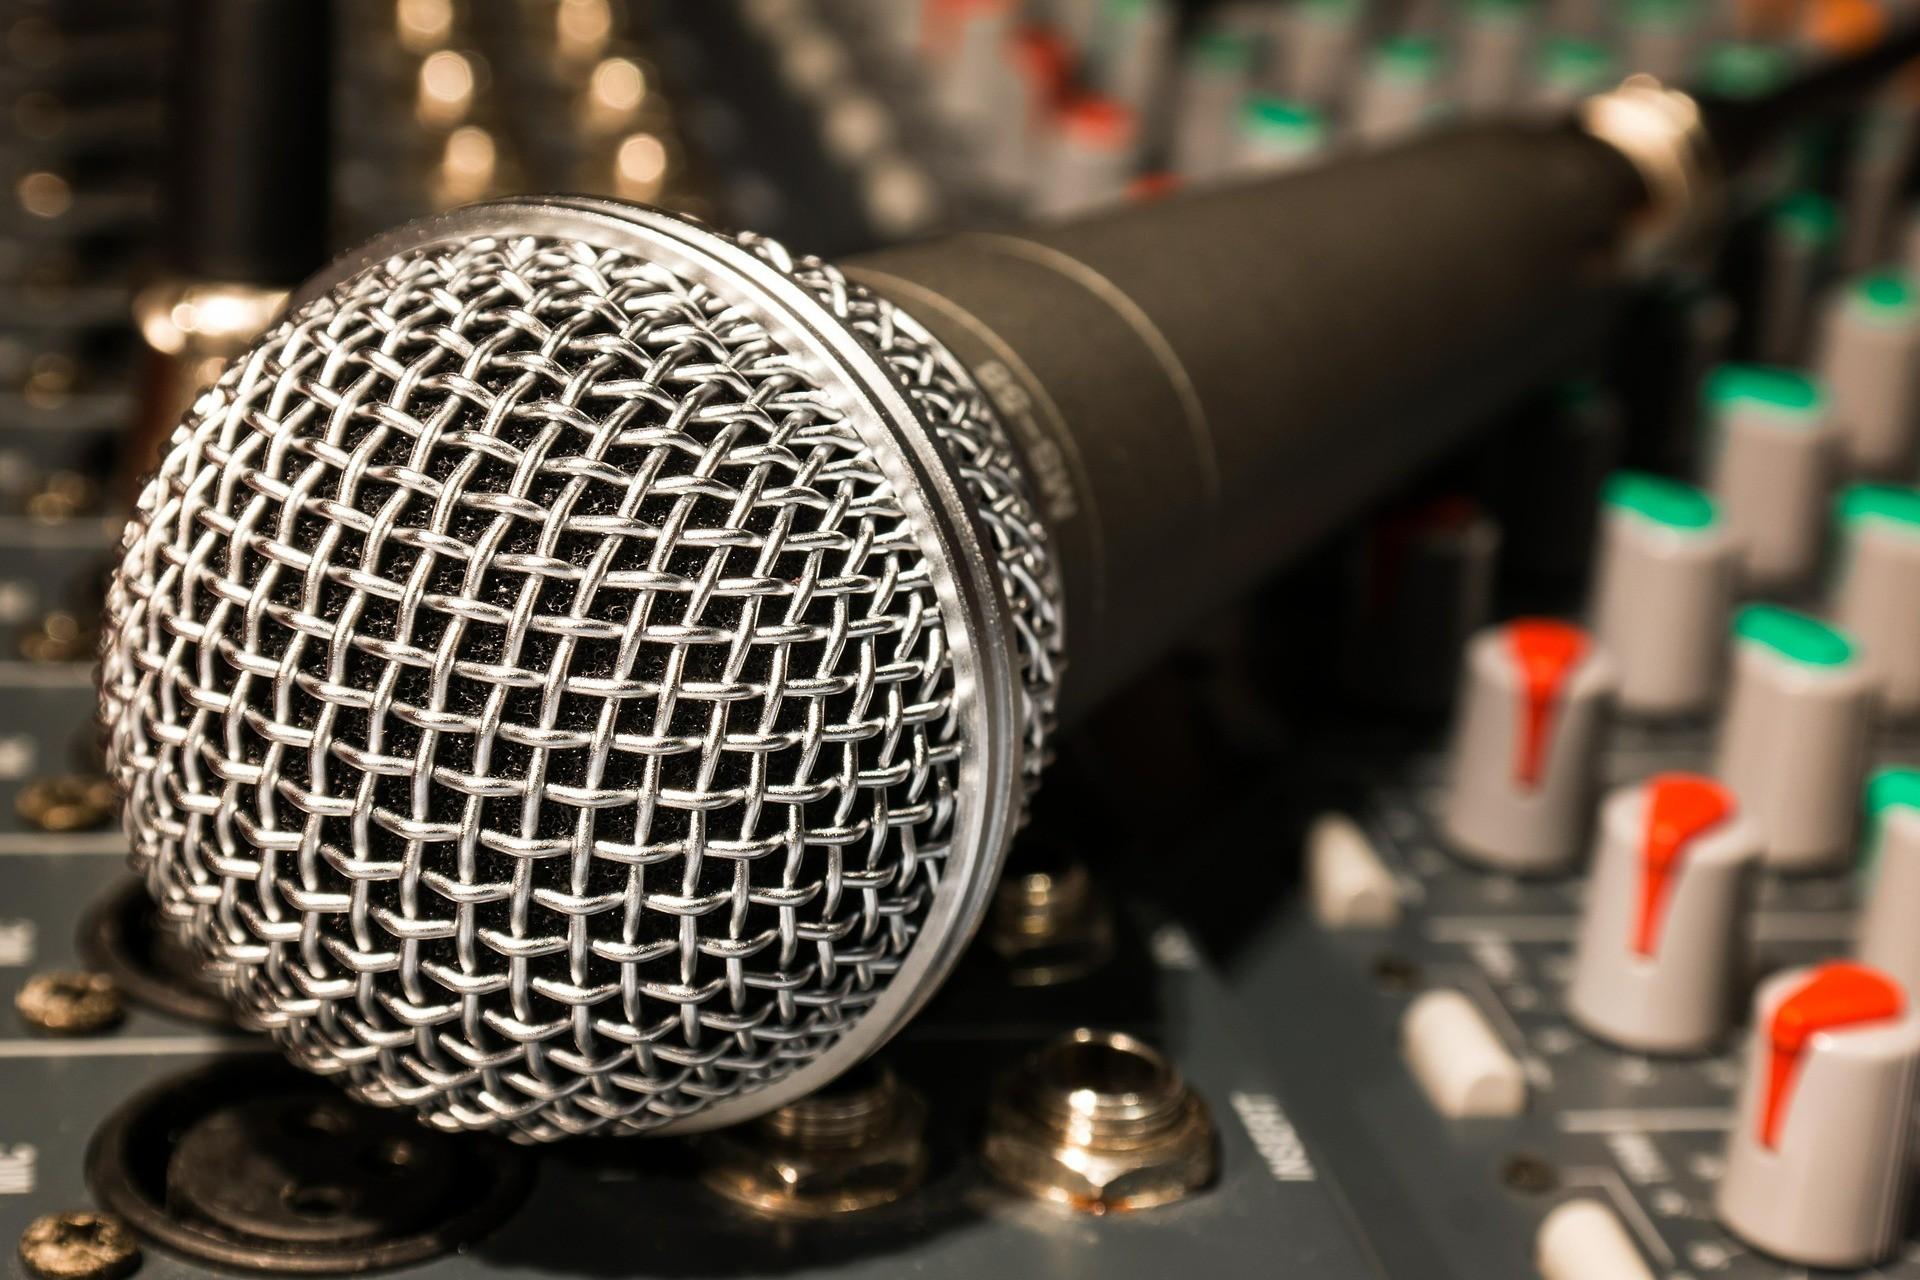 Studio Mikrofon ist die Richtcharakteristik